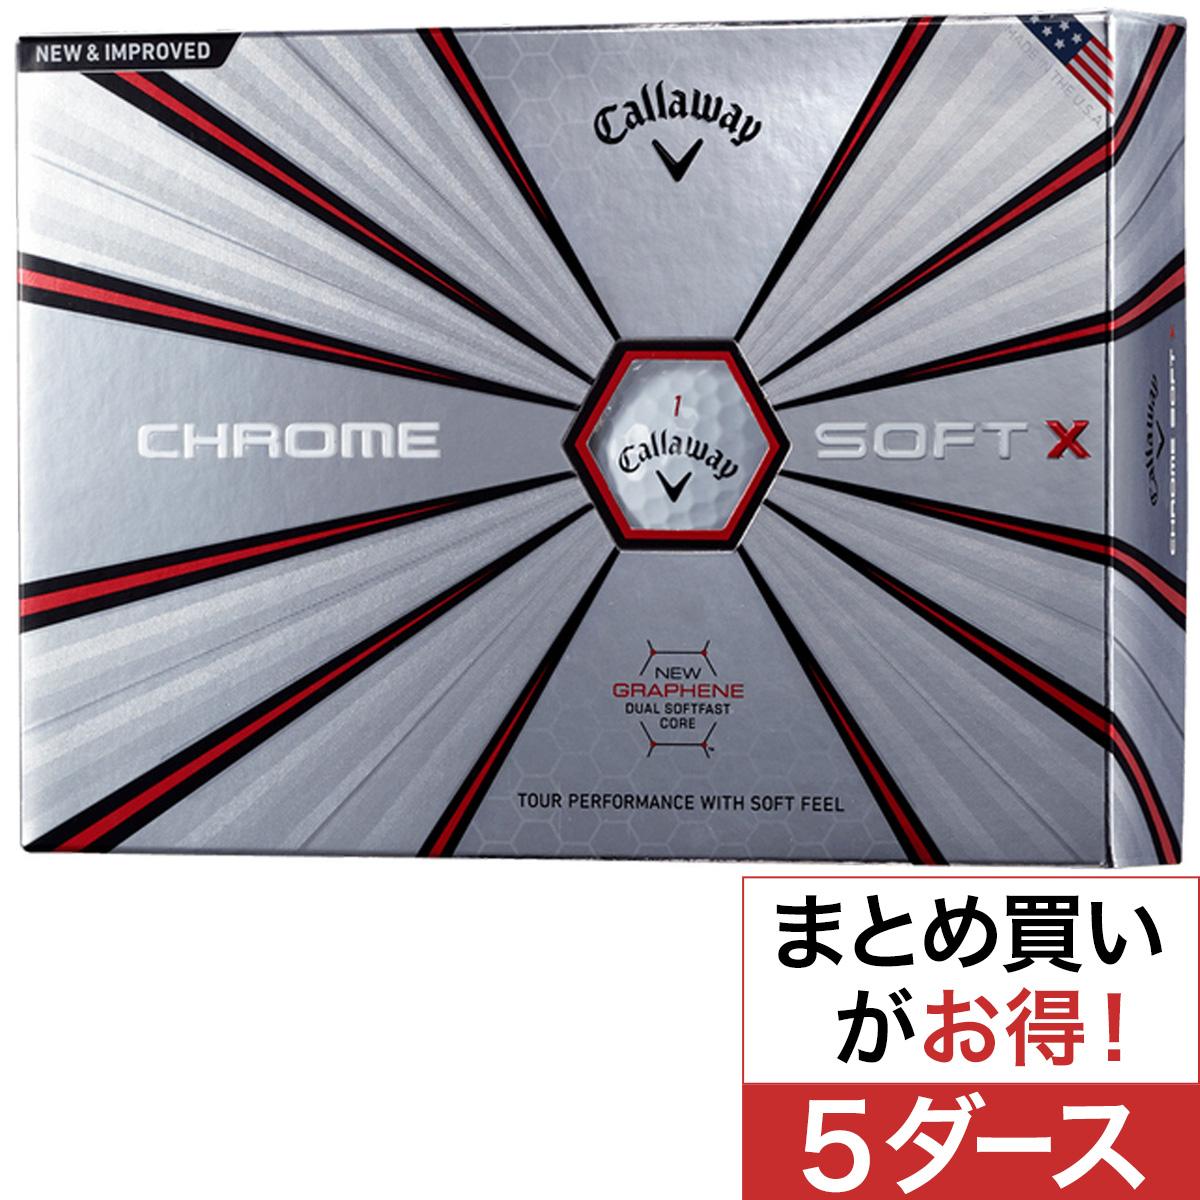 CHROME SOFT X ボール 5ダースセット